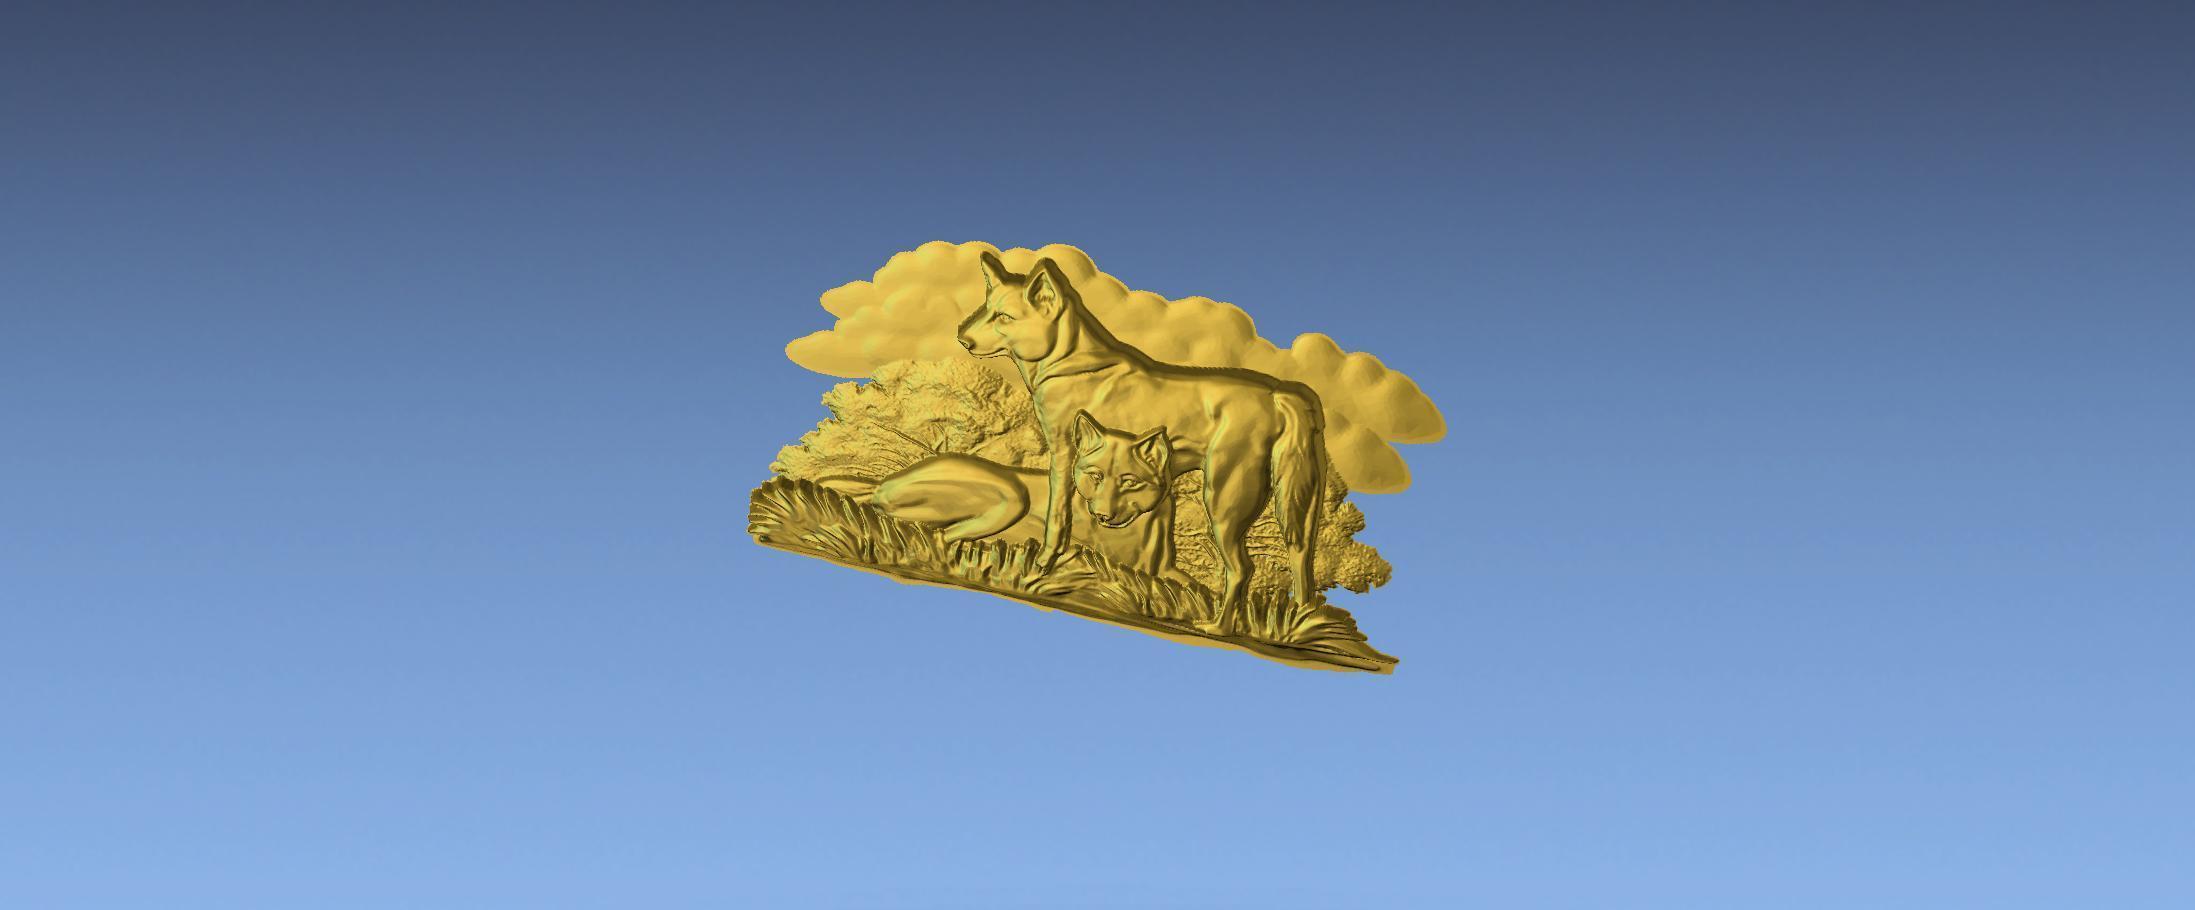 4.jpg Download free STL file AUSTRALIAN DINGOS 3D STL FILE • 3D printer design, ALPHA_MENA